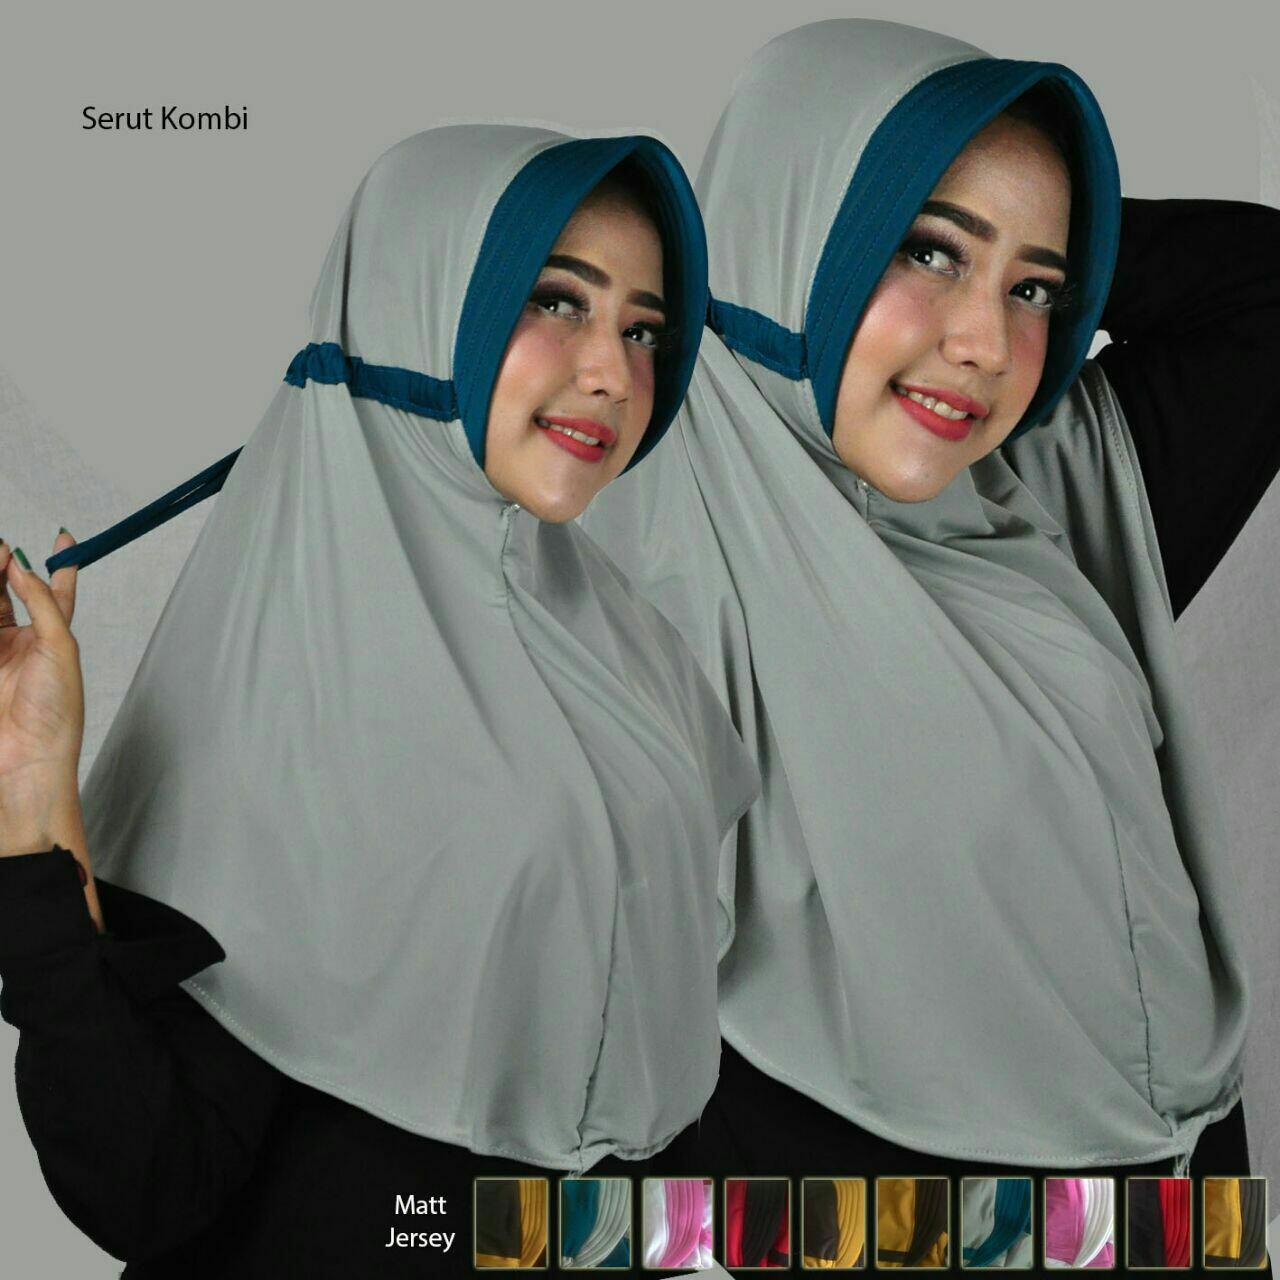 Kerudung Jilbab Syari Hijab Instan Pastan Serut Kombi